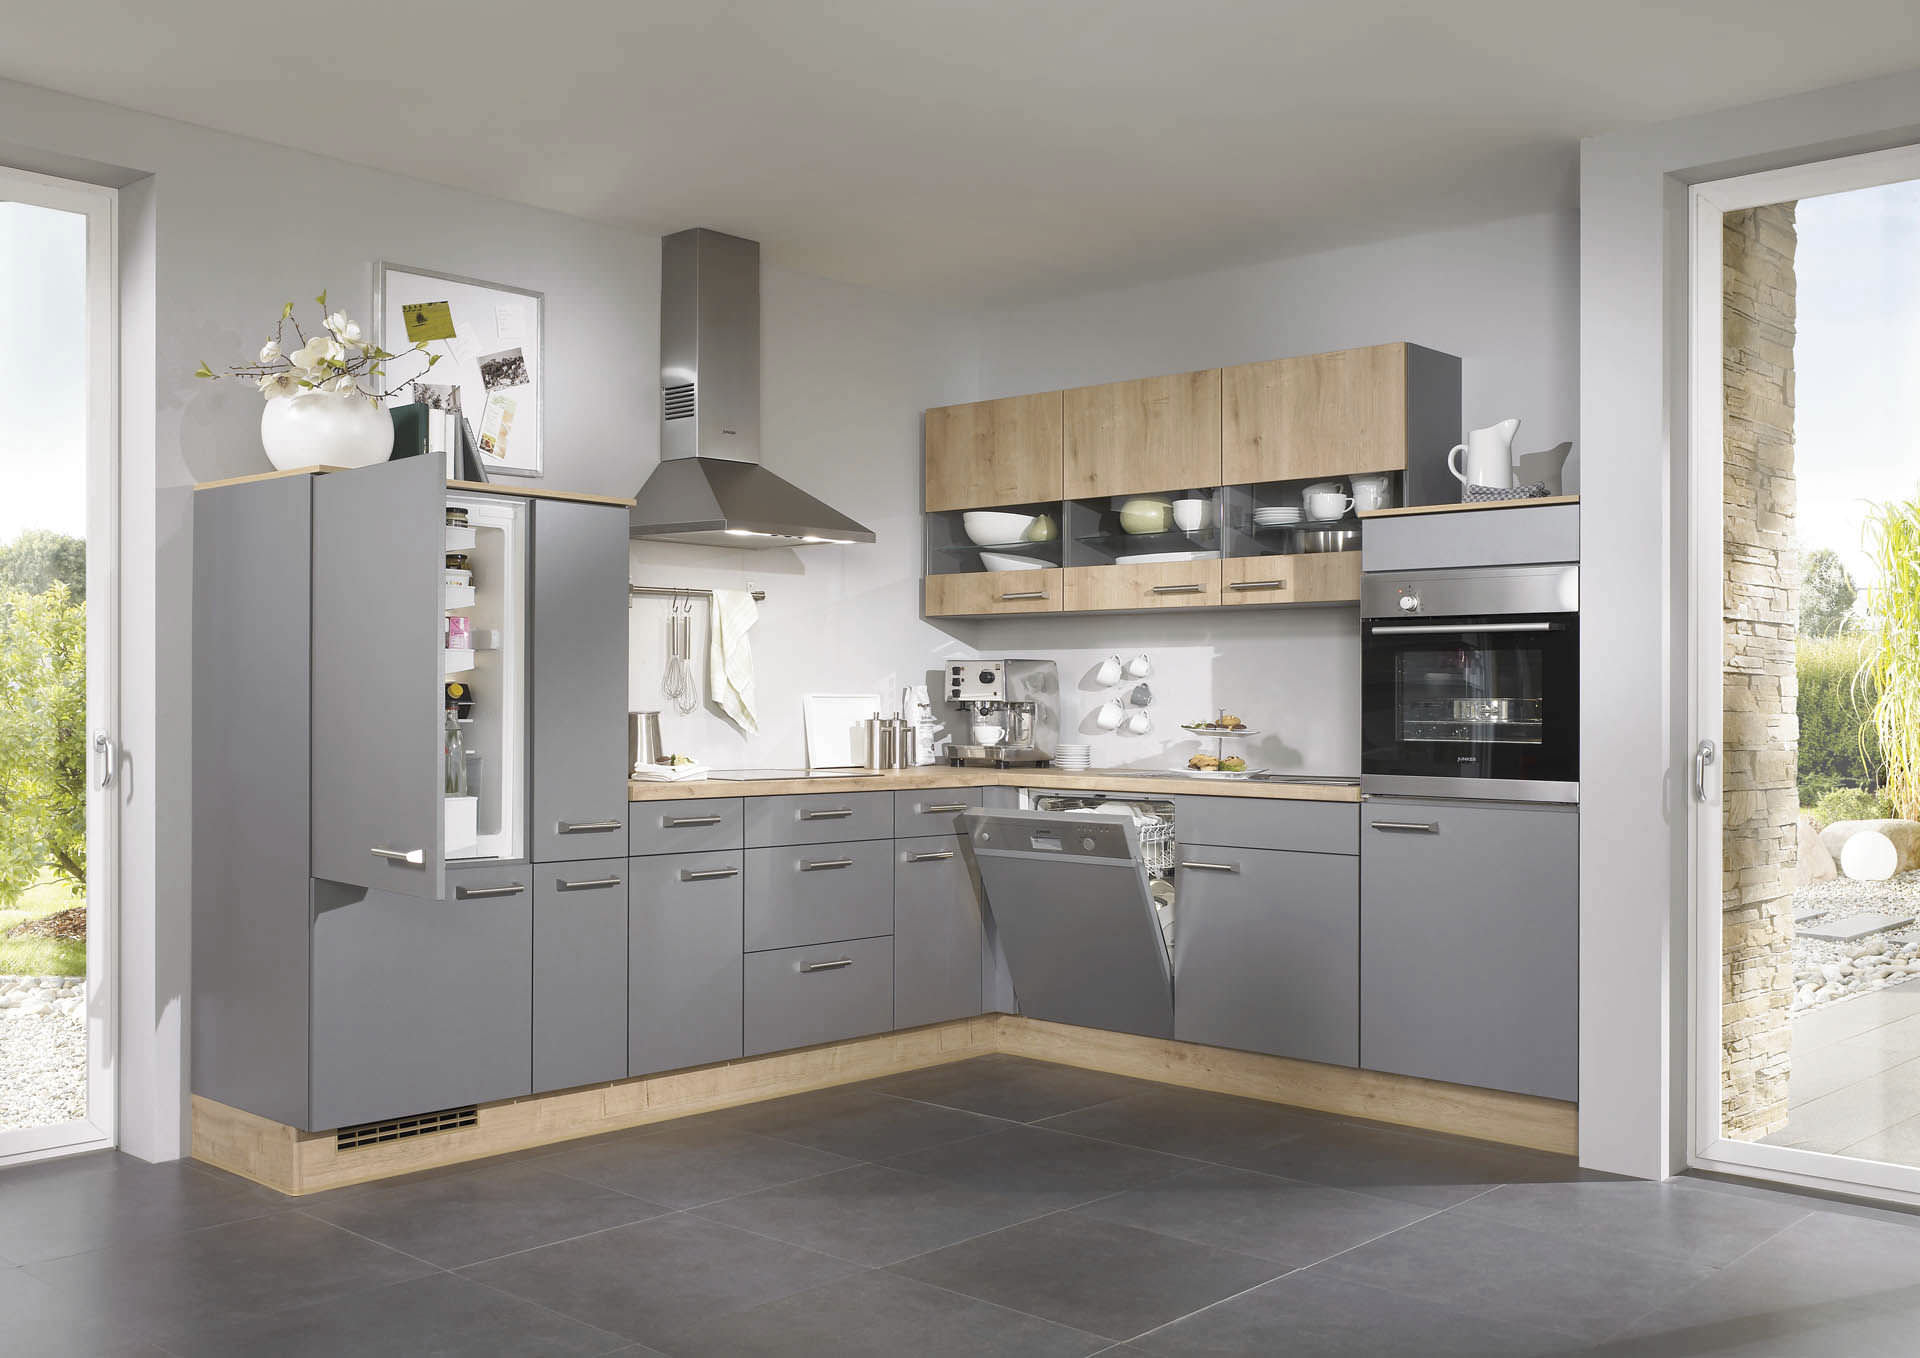 Moderne Küche / Holzfurnier / lackiert - PIA 638 - nobilia